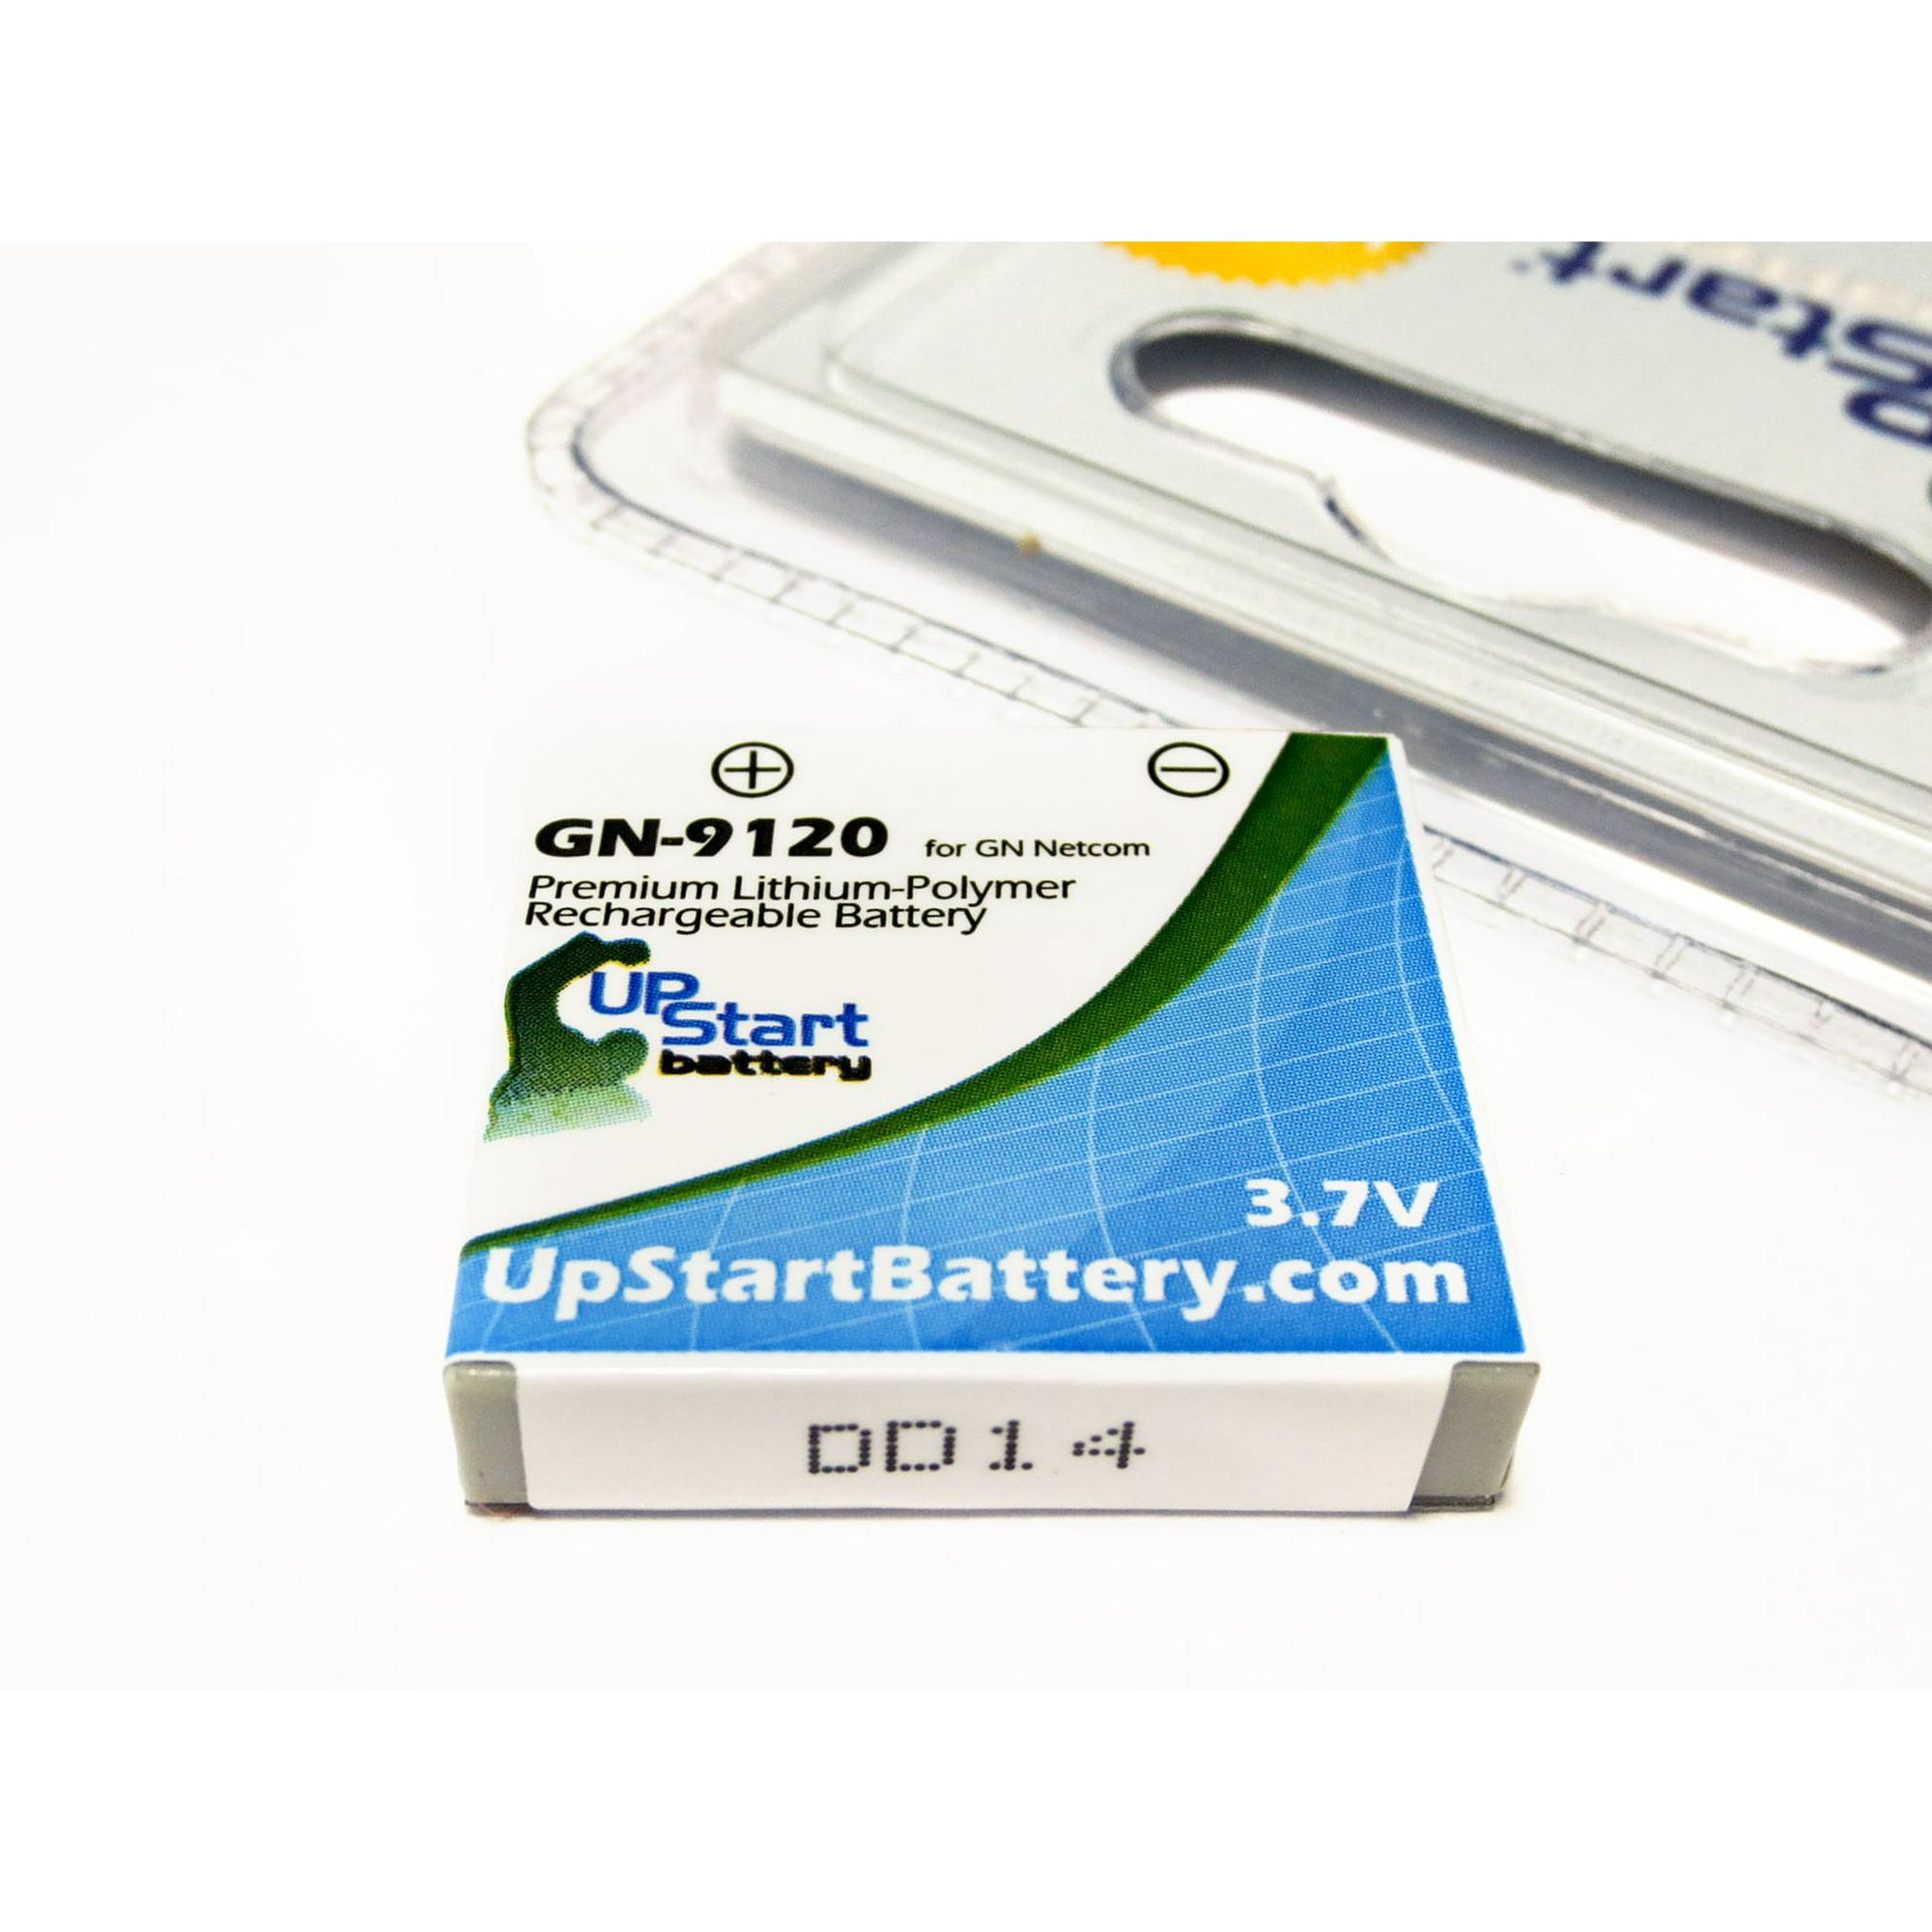 9b981999361 2x Pack - Jabra SG081003 Battery - Replacement for Jabra Wireless Headset  Battery (270mAh, 3.7V, Lithium Polymer) | Walmart Canada